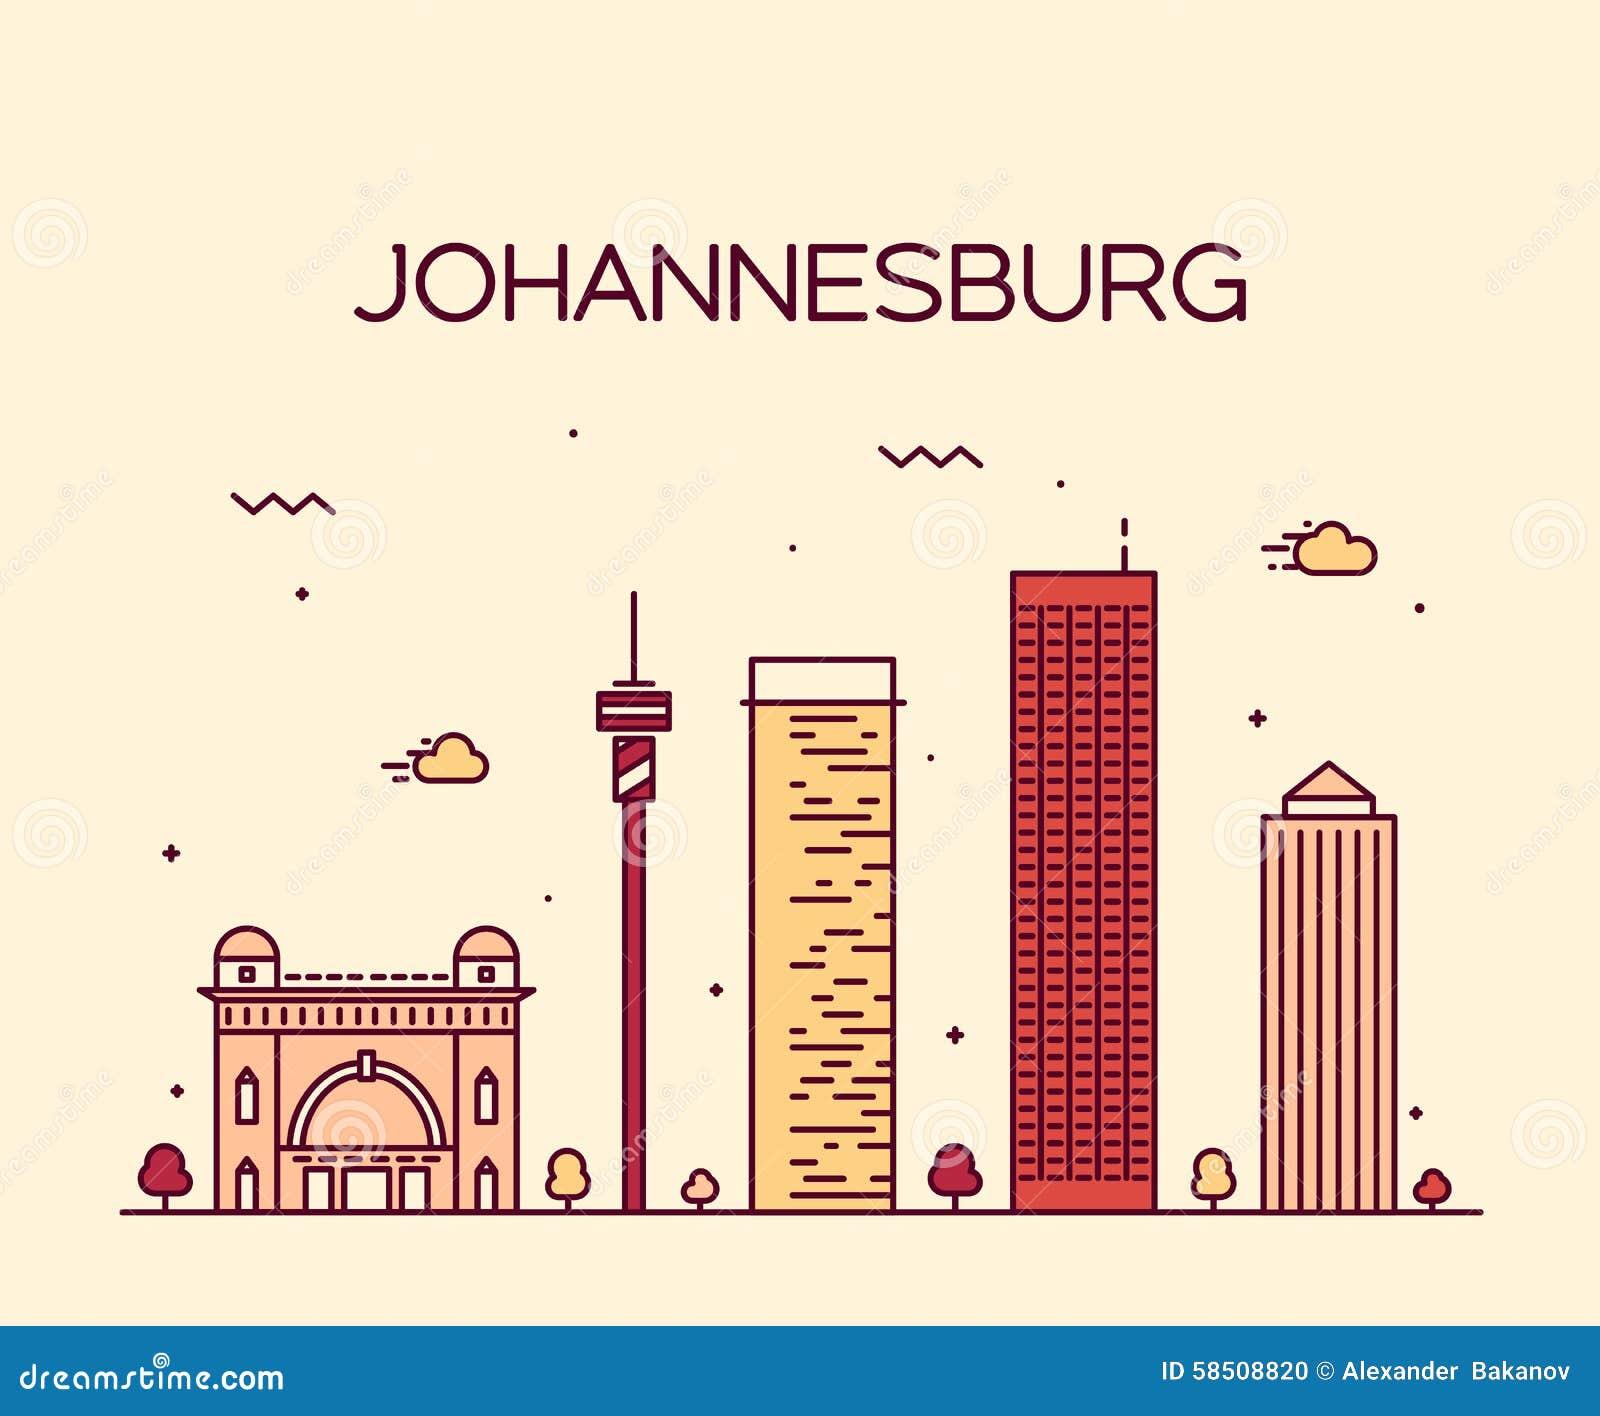 Johannesburg skyline cartoon vector cartoondealer 38326195 thecheapjerseys Image collections